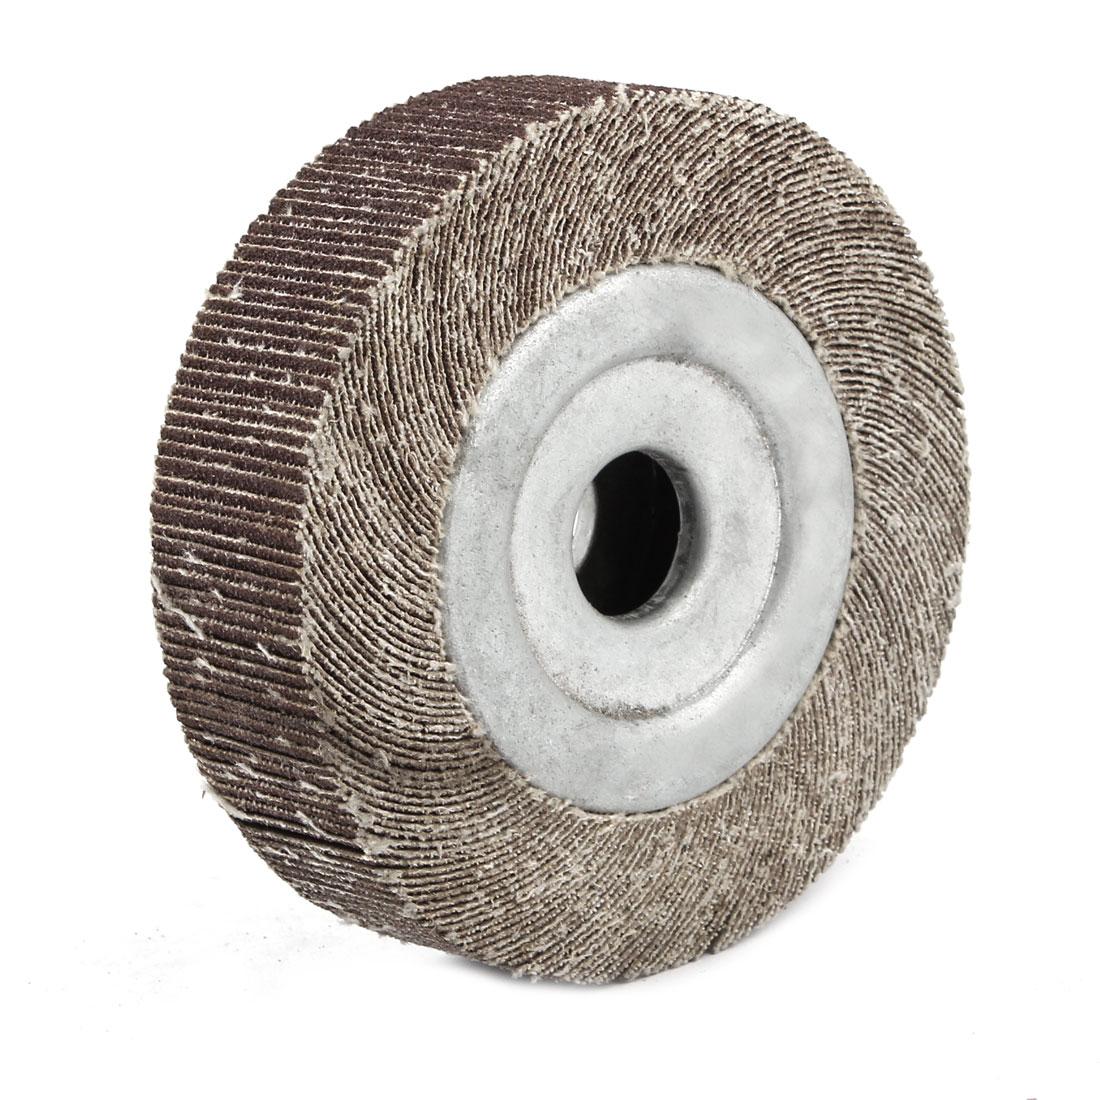 90mm x 16mm x 25mm Sanding Abrasive Flap Wheel Sander Tool